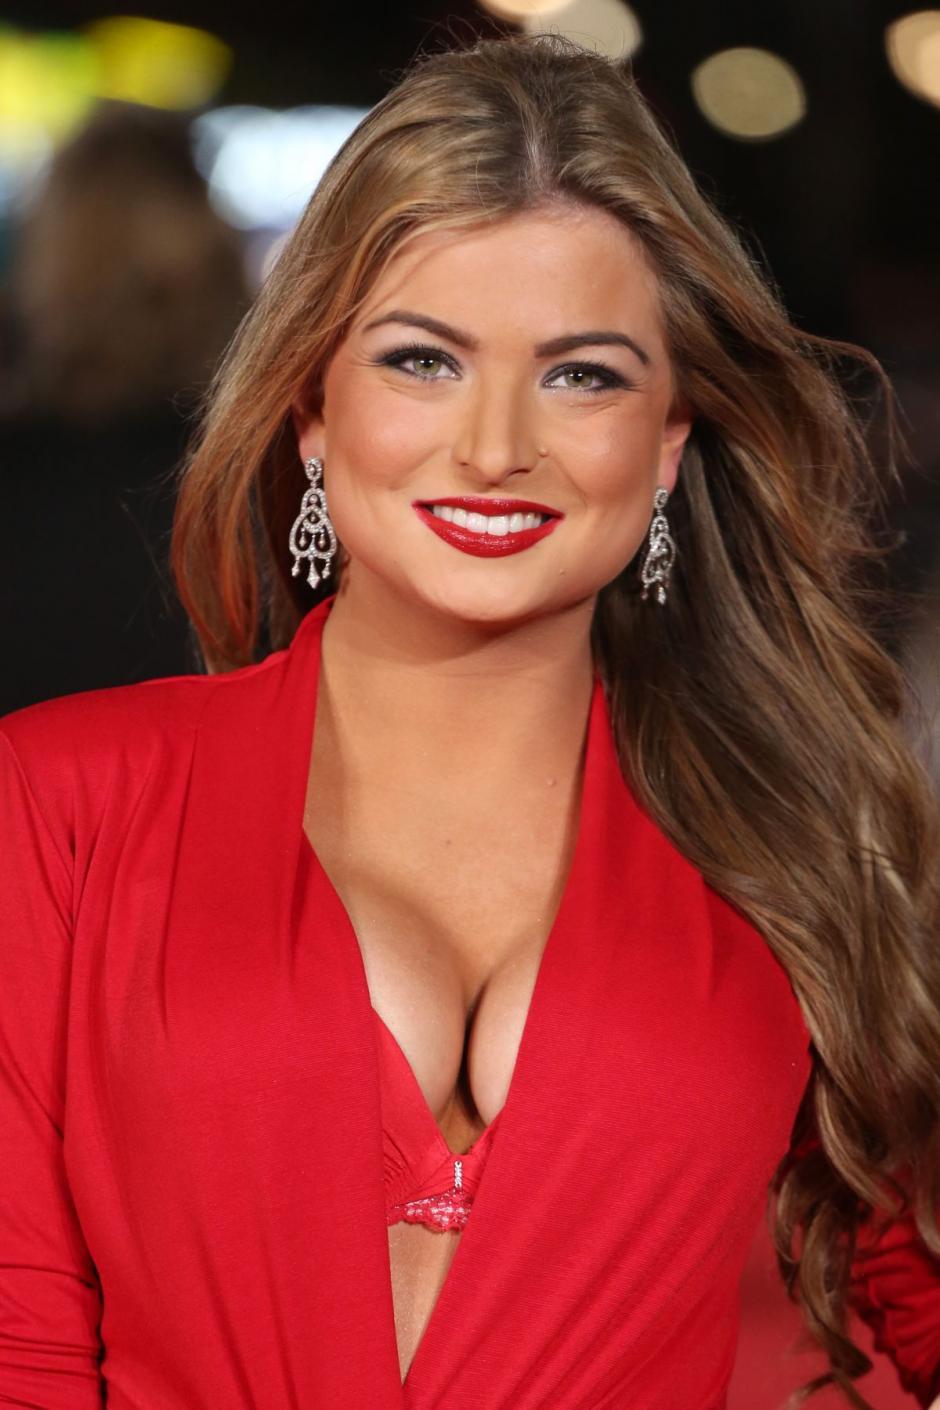 Holland ha dejado de ser Miss Reino Unido. (Foto: EFE)